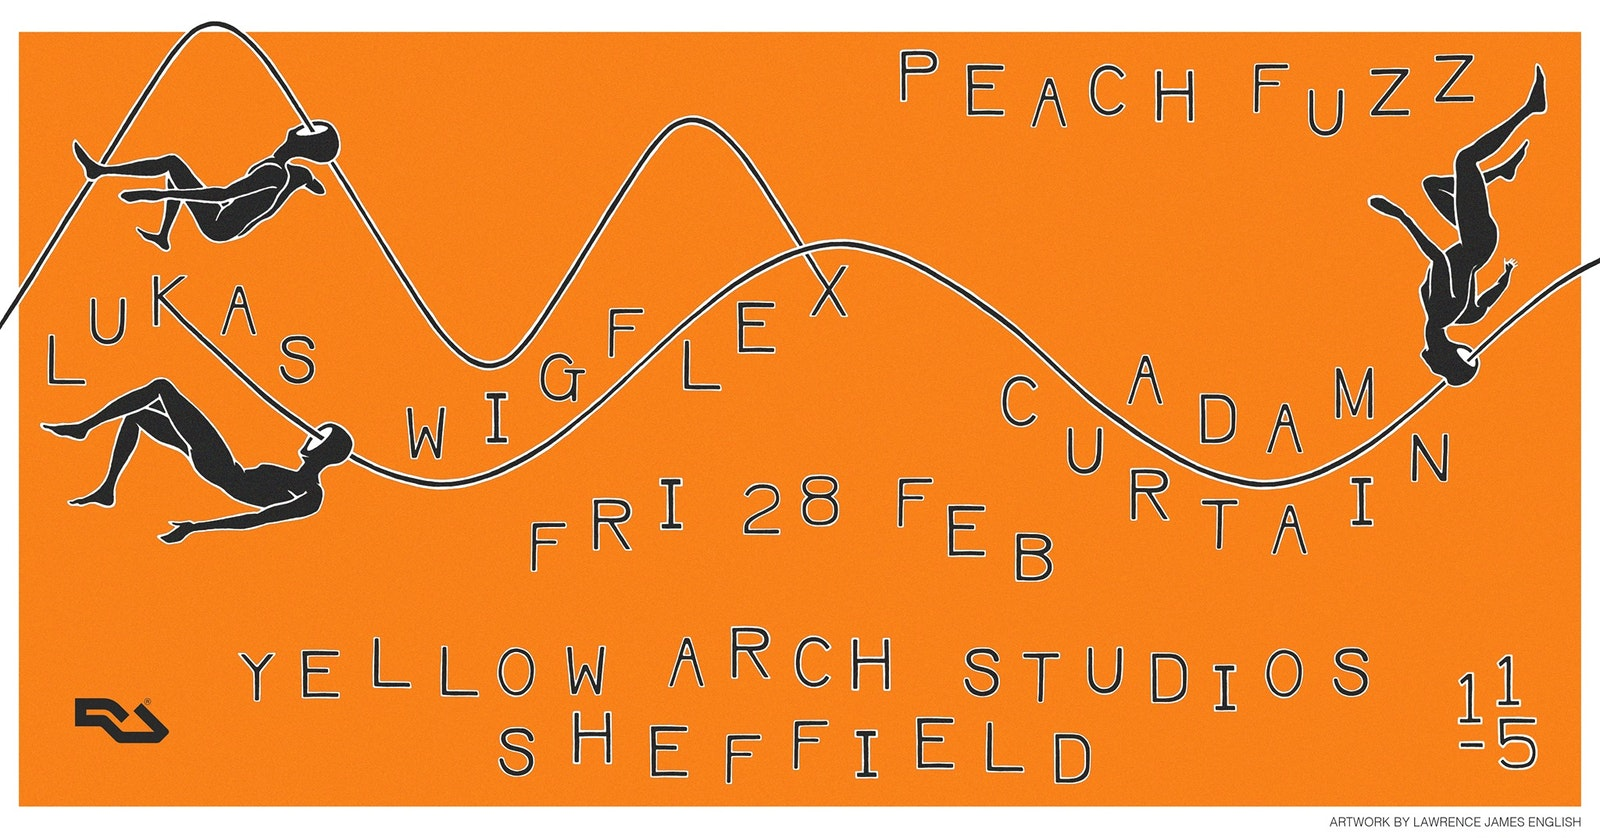 Peach Fuzz Sheffield w/ Adam Curtain, Lukas Wigflex